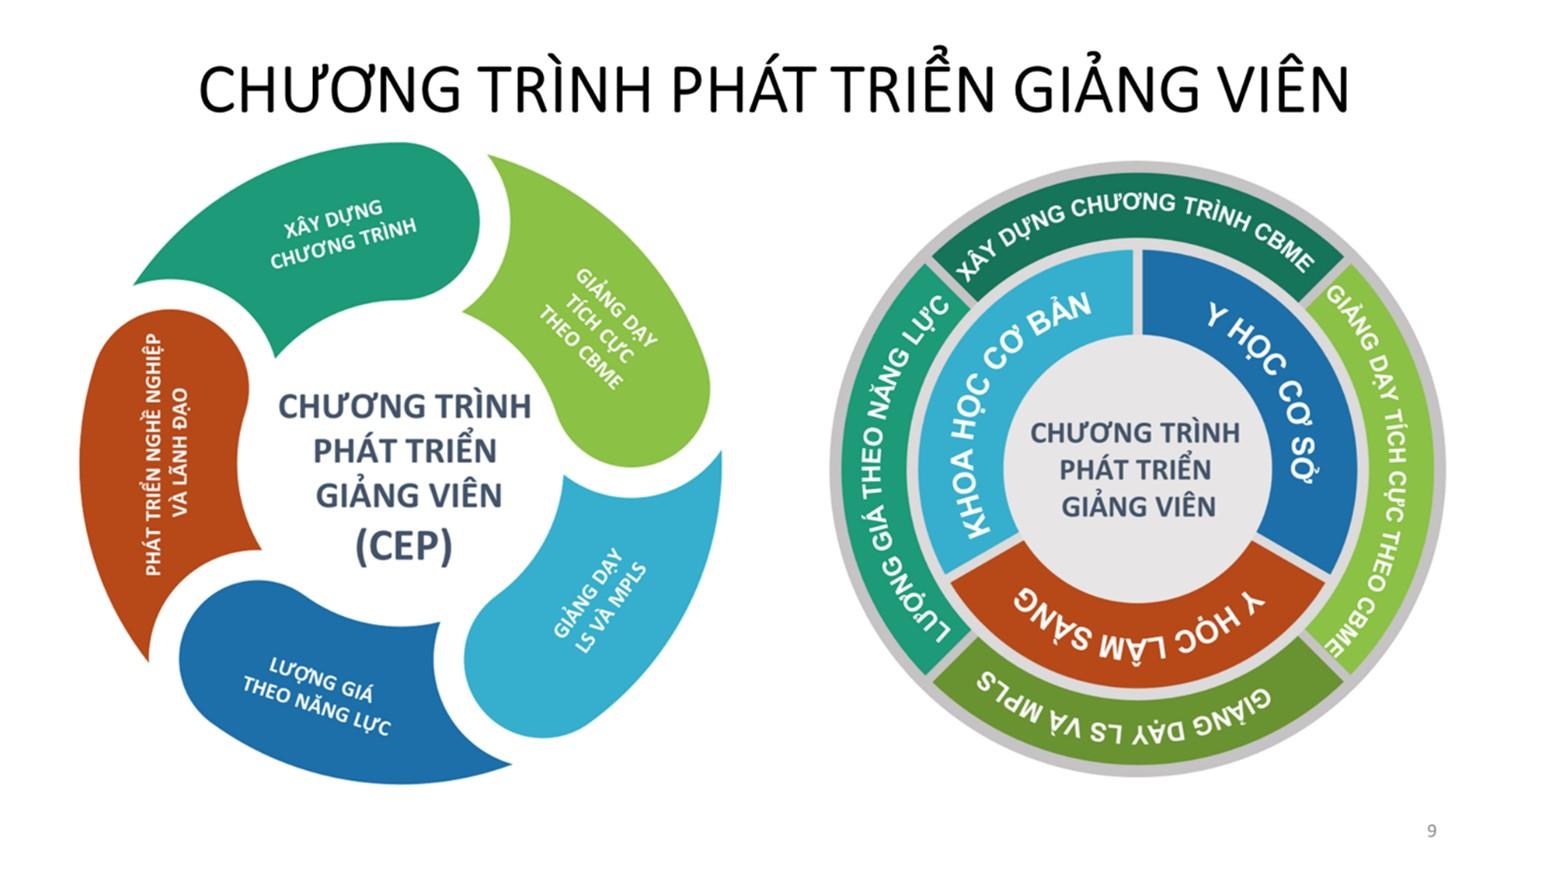 CHUONG TRINH PTGV